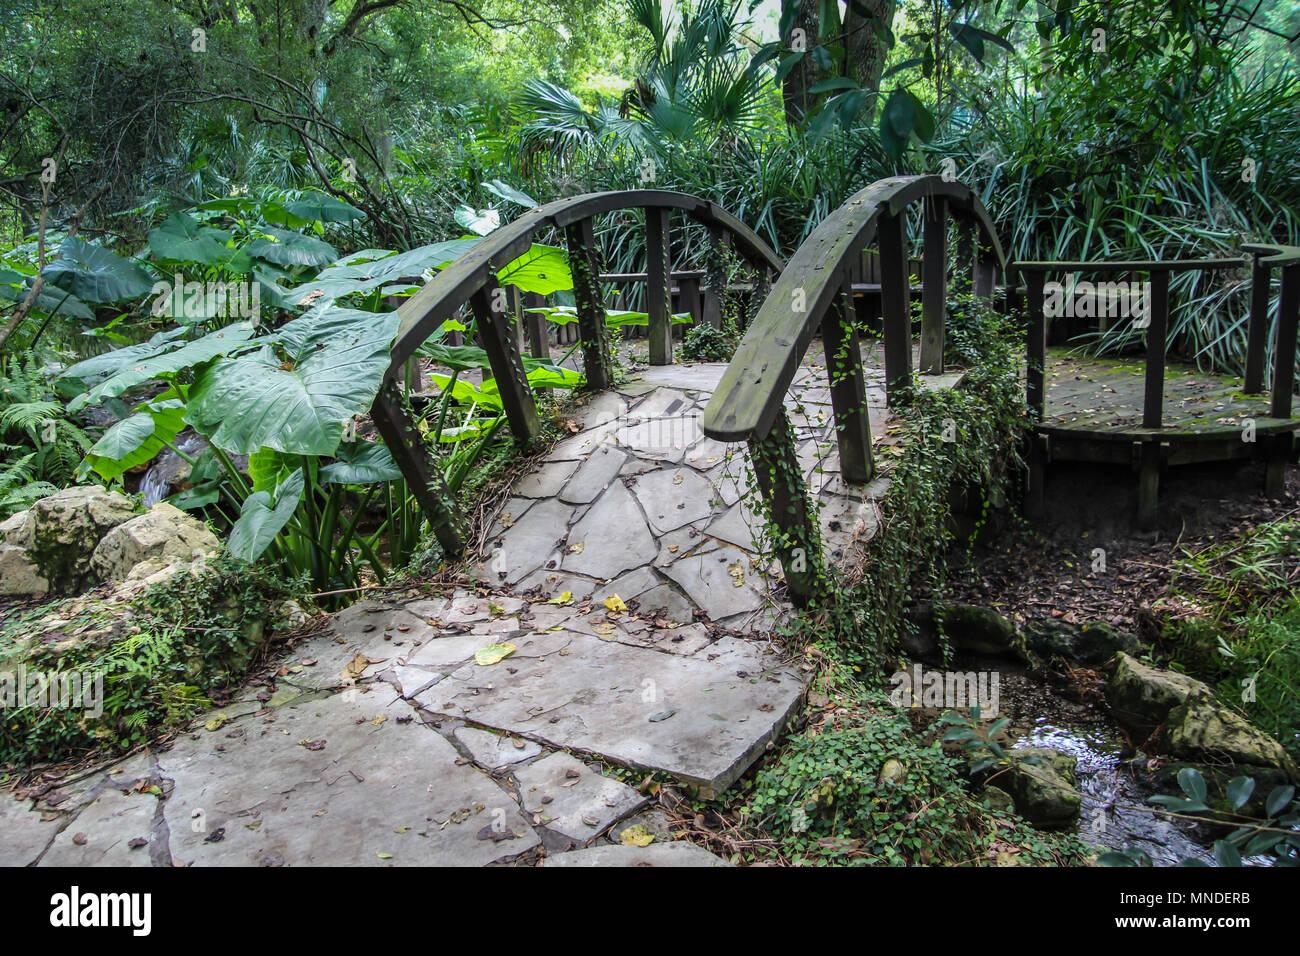 kanapaha botanical gardens in gainesville florida - Gainesville Botanical Garden